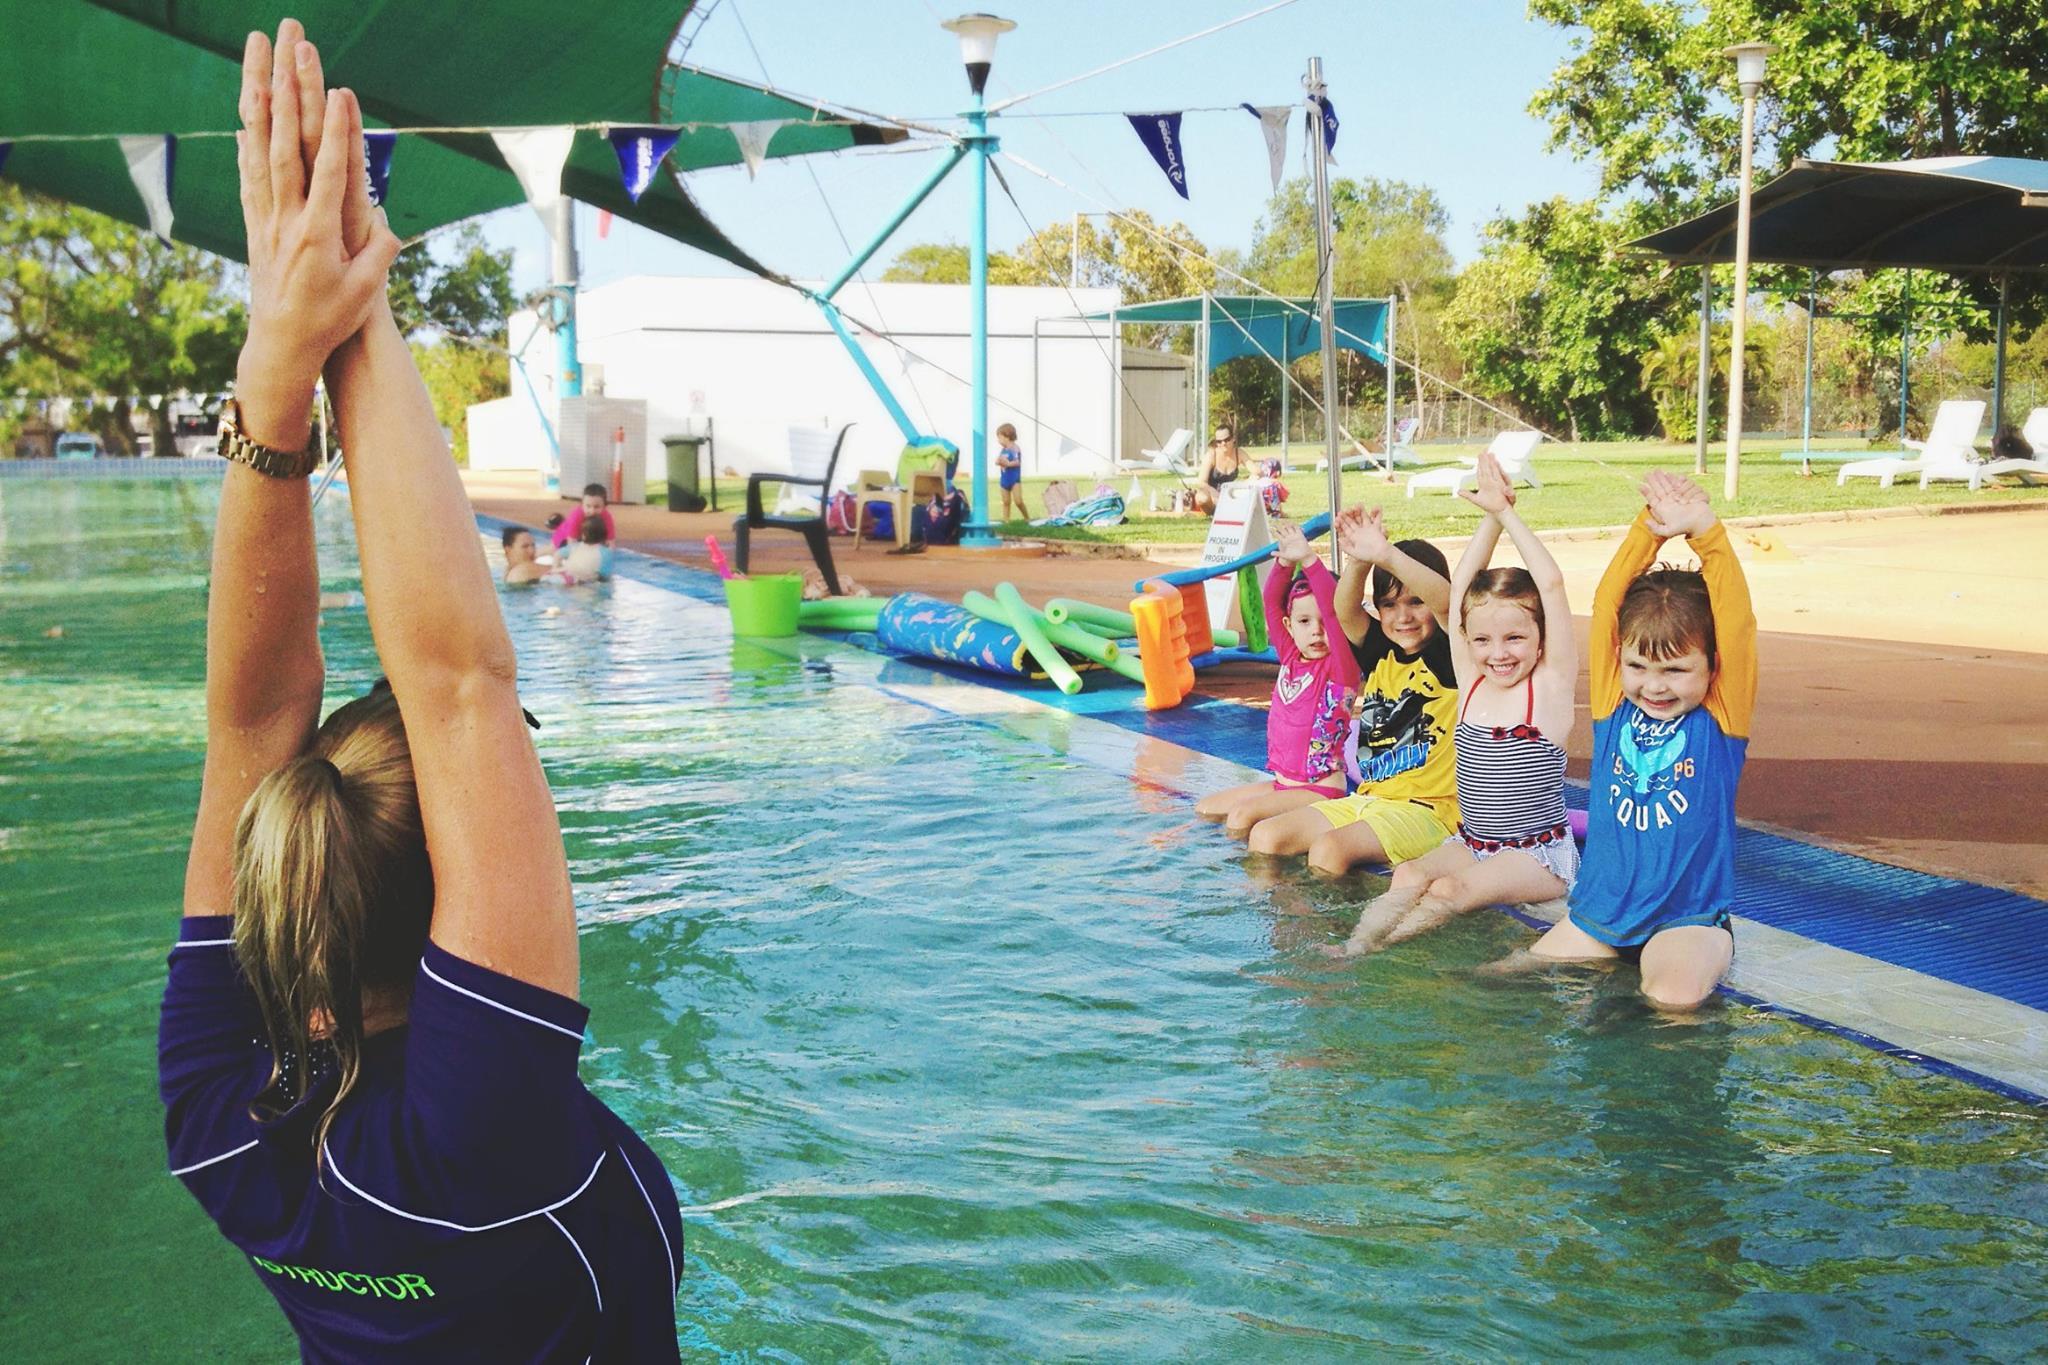 nt swim school, learn to swim, gove